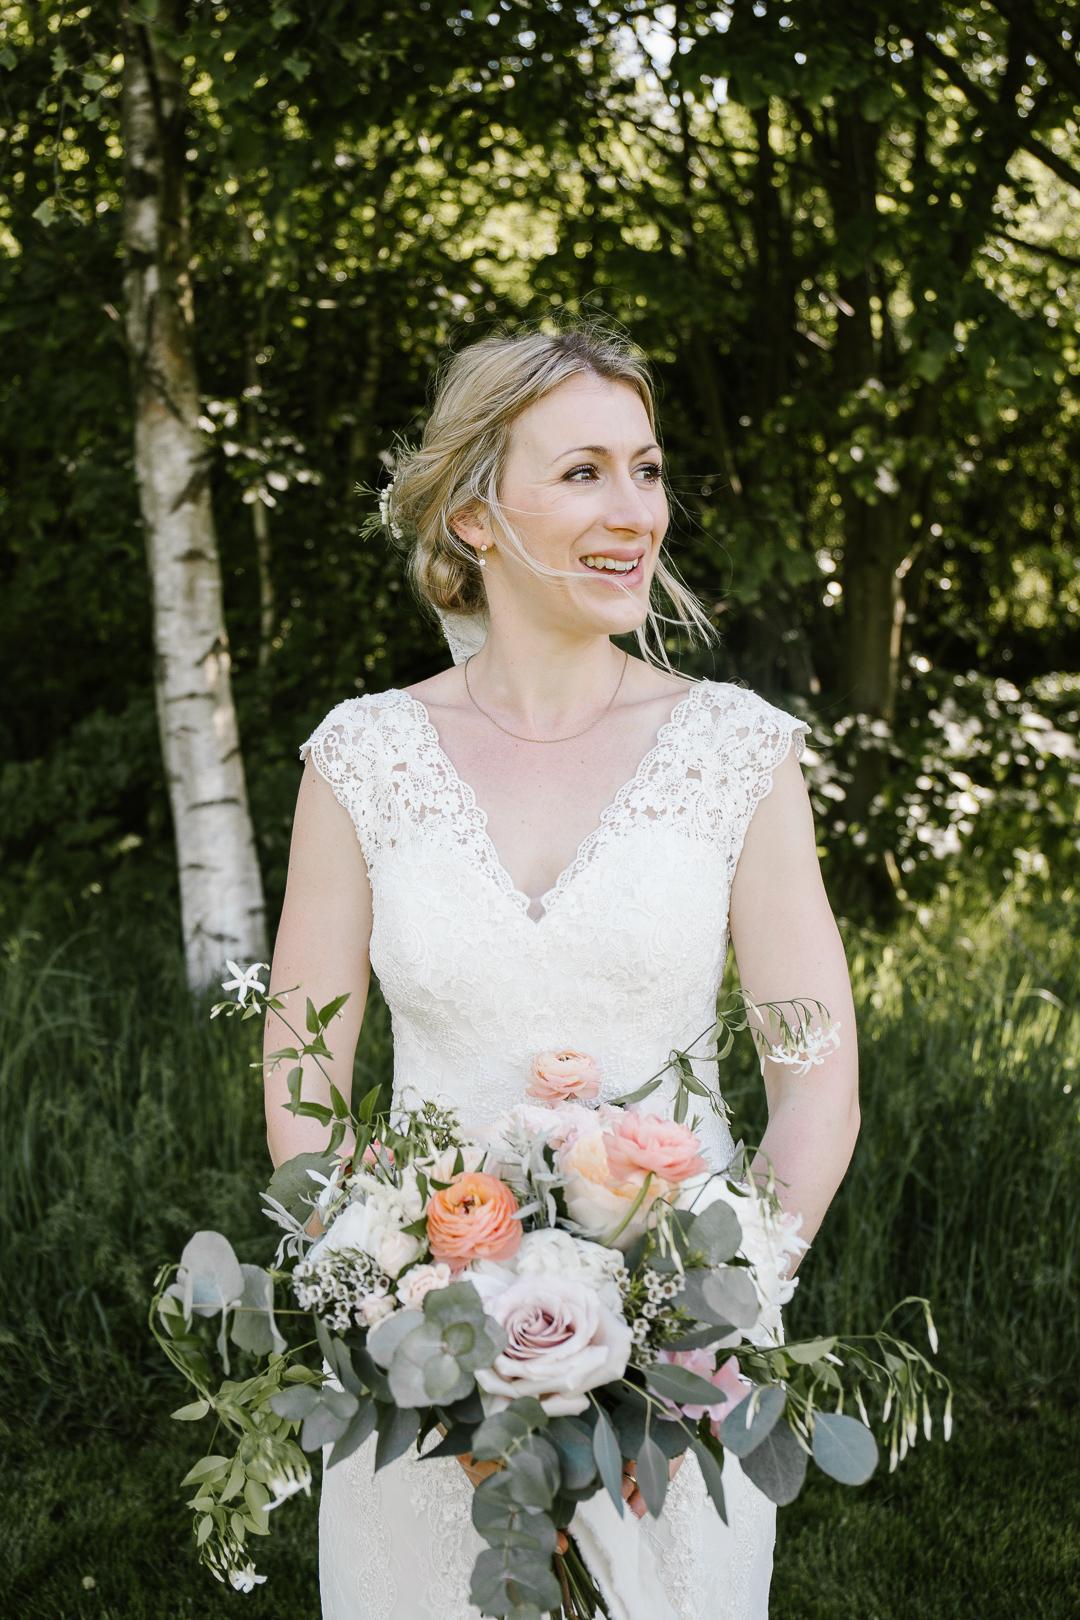 Beth + Will, Chaucer Barns, Chaucer Barns Wedding, Spring Wedding-203.jpg